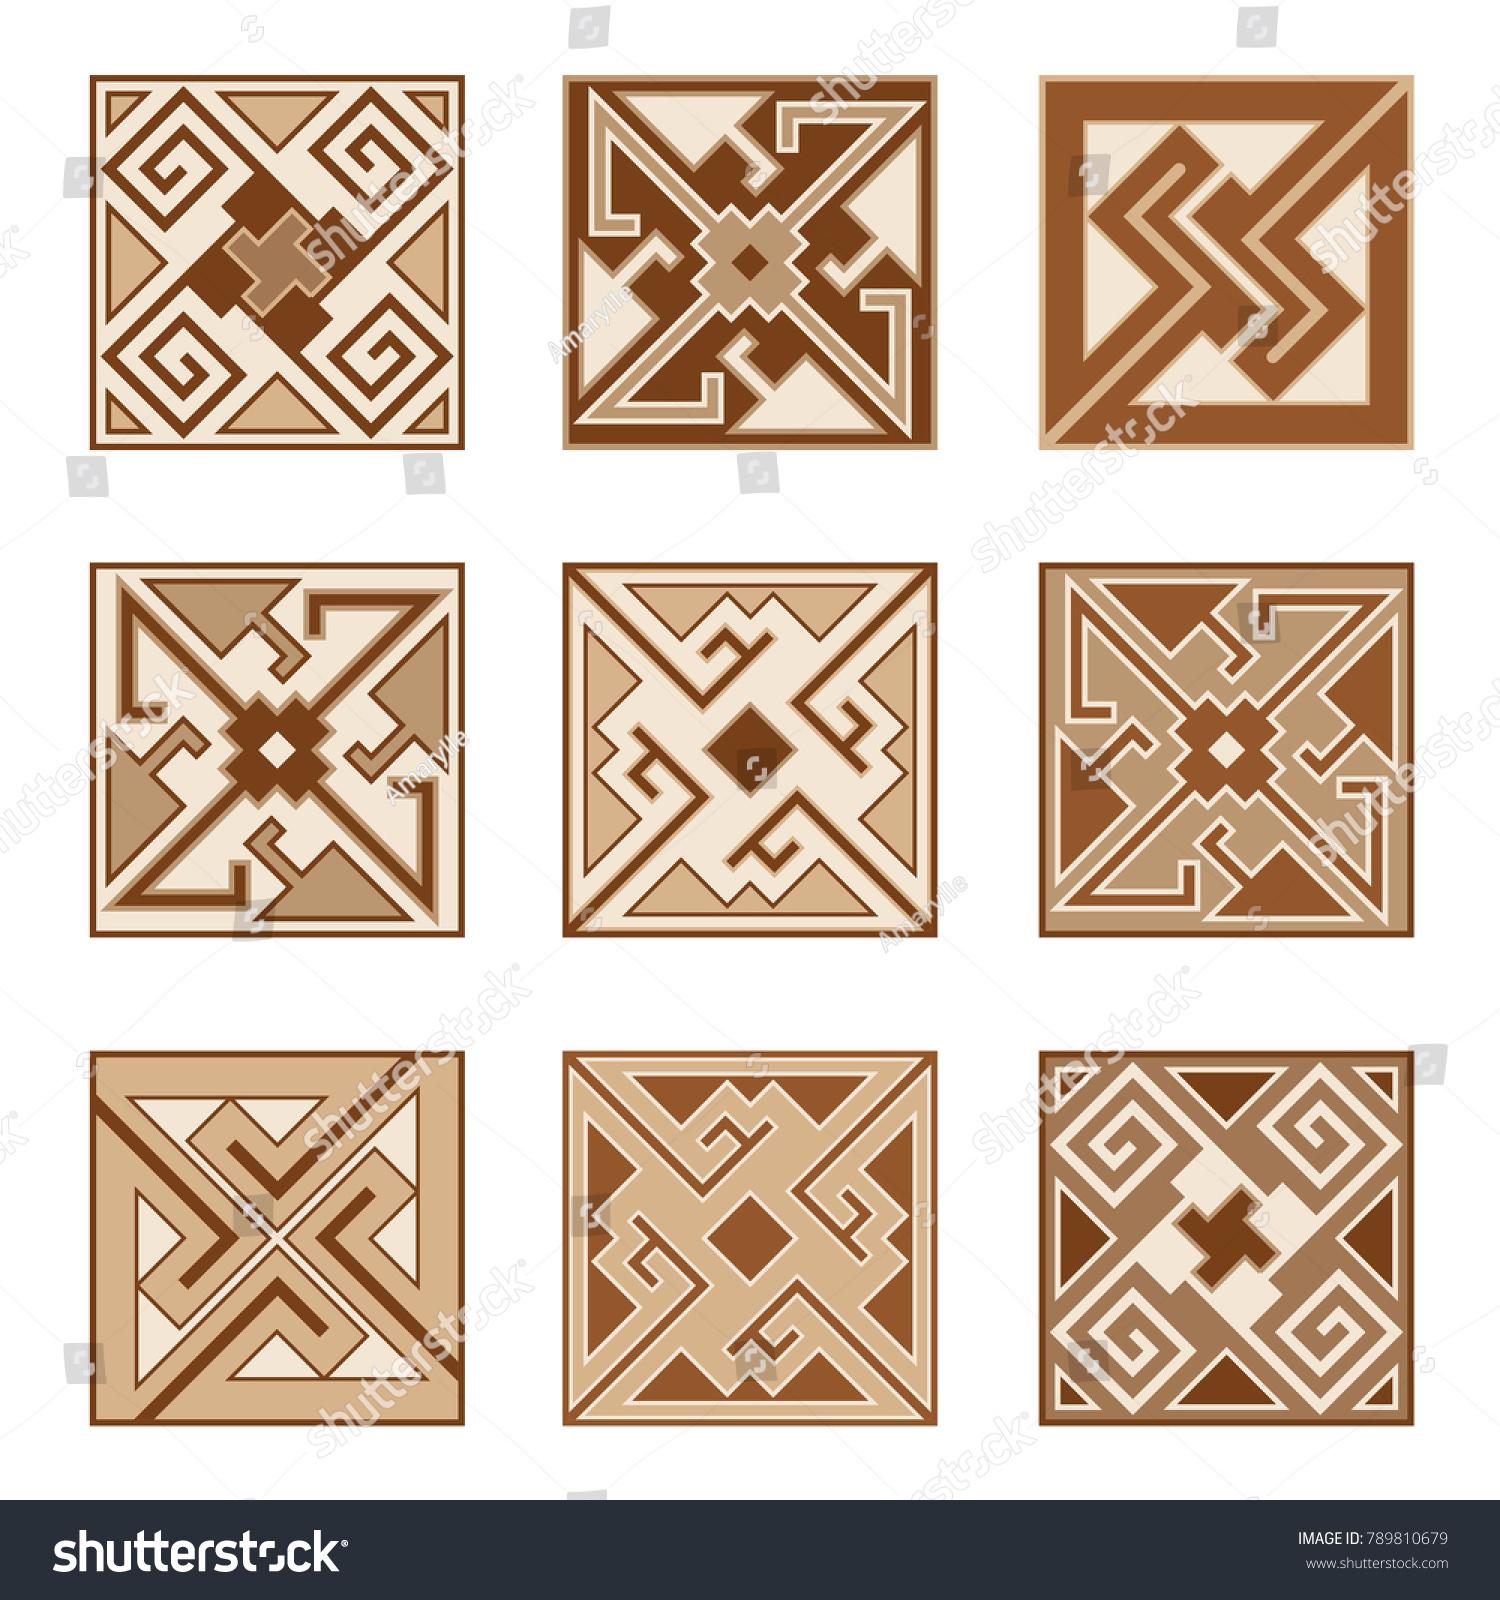 Set Parquet Floor Ceramic Tile Patterns Stock Vector 789810679 ...